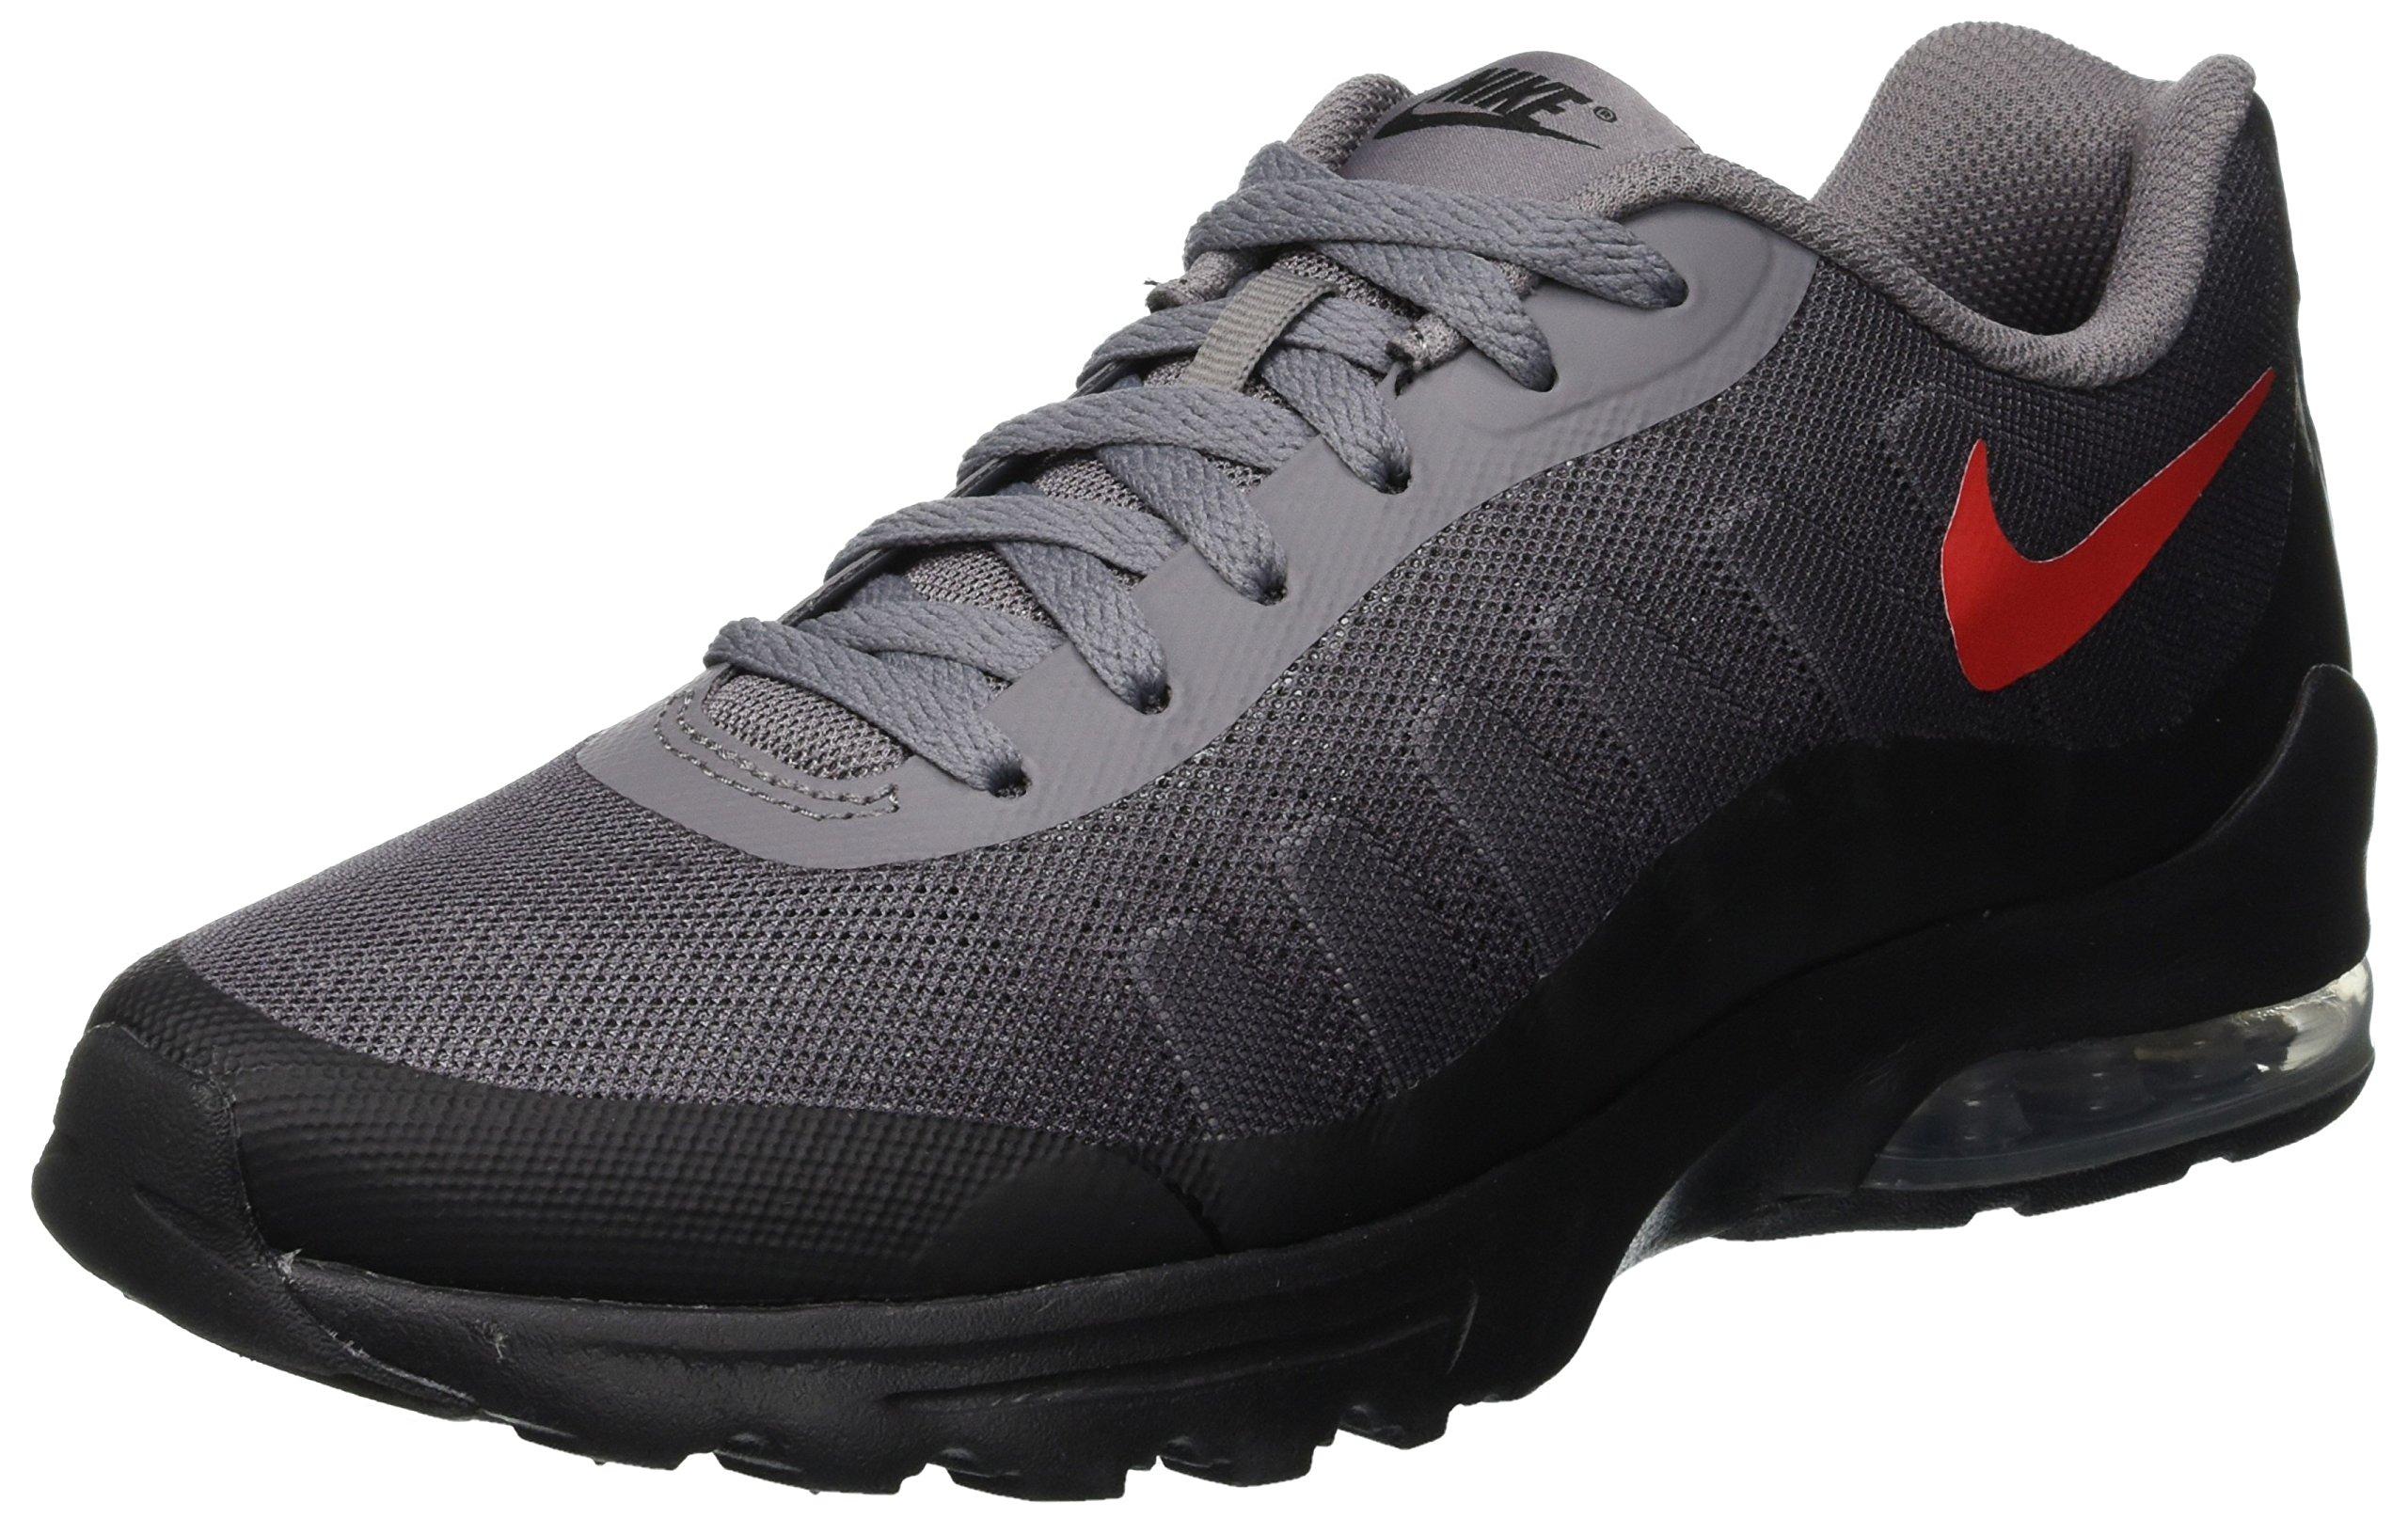 NIKE Men's Air Max Invigor Print Running Shoe, Gunsmoke/University Red-Black, 7.5 by NIKE